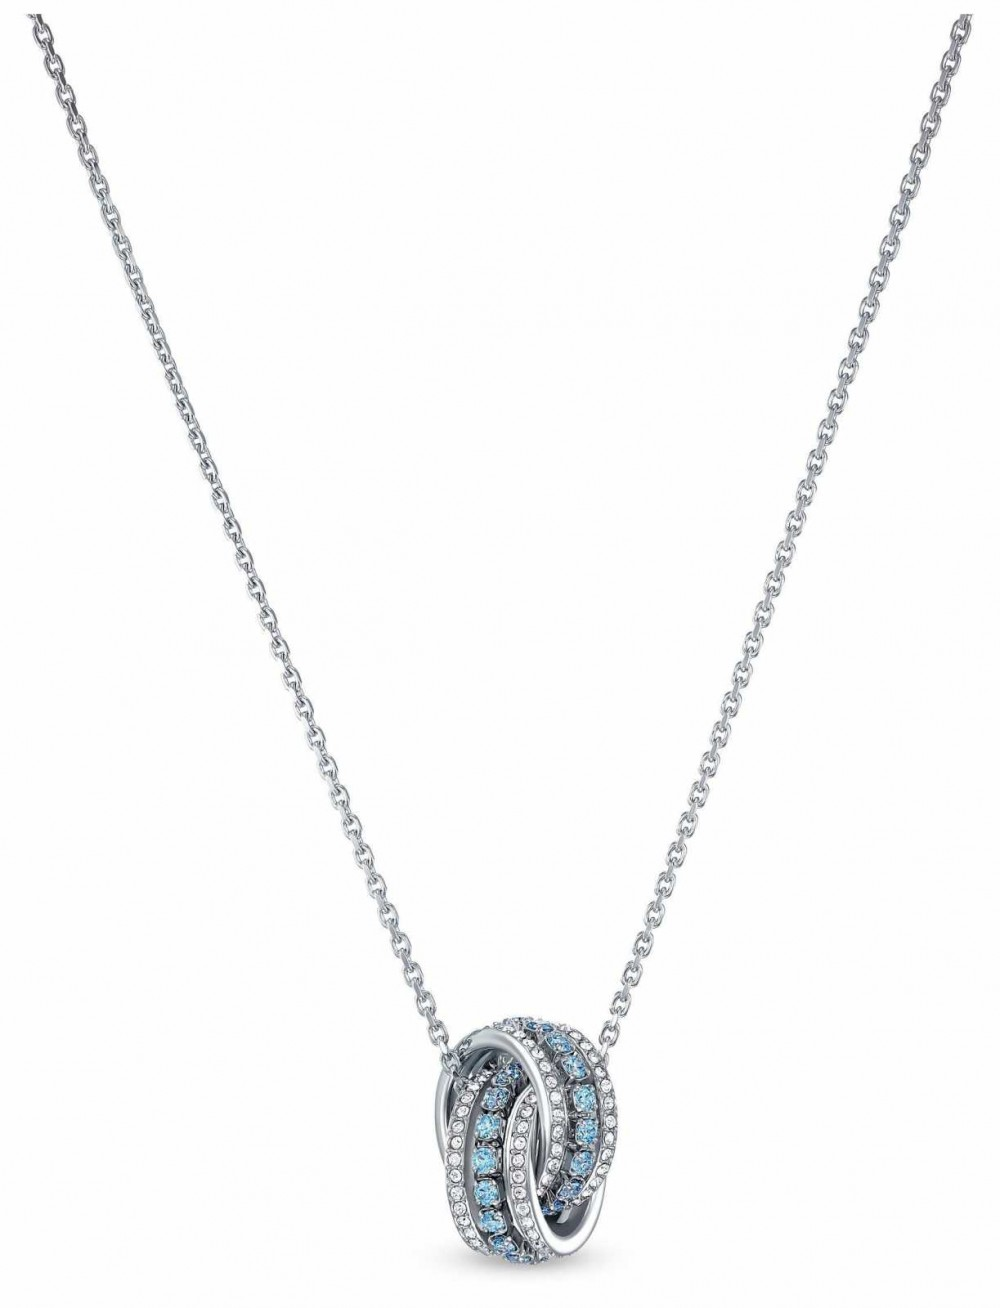 Swarovski | Further | Rhodium Plated | Blue Crystal | Pendant | 5537106